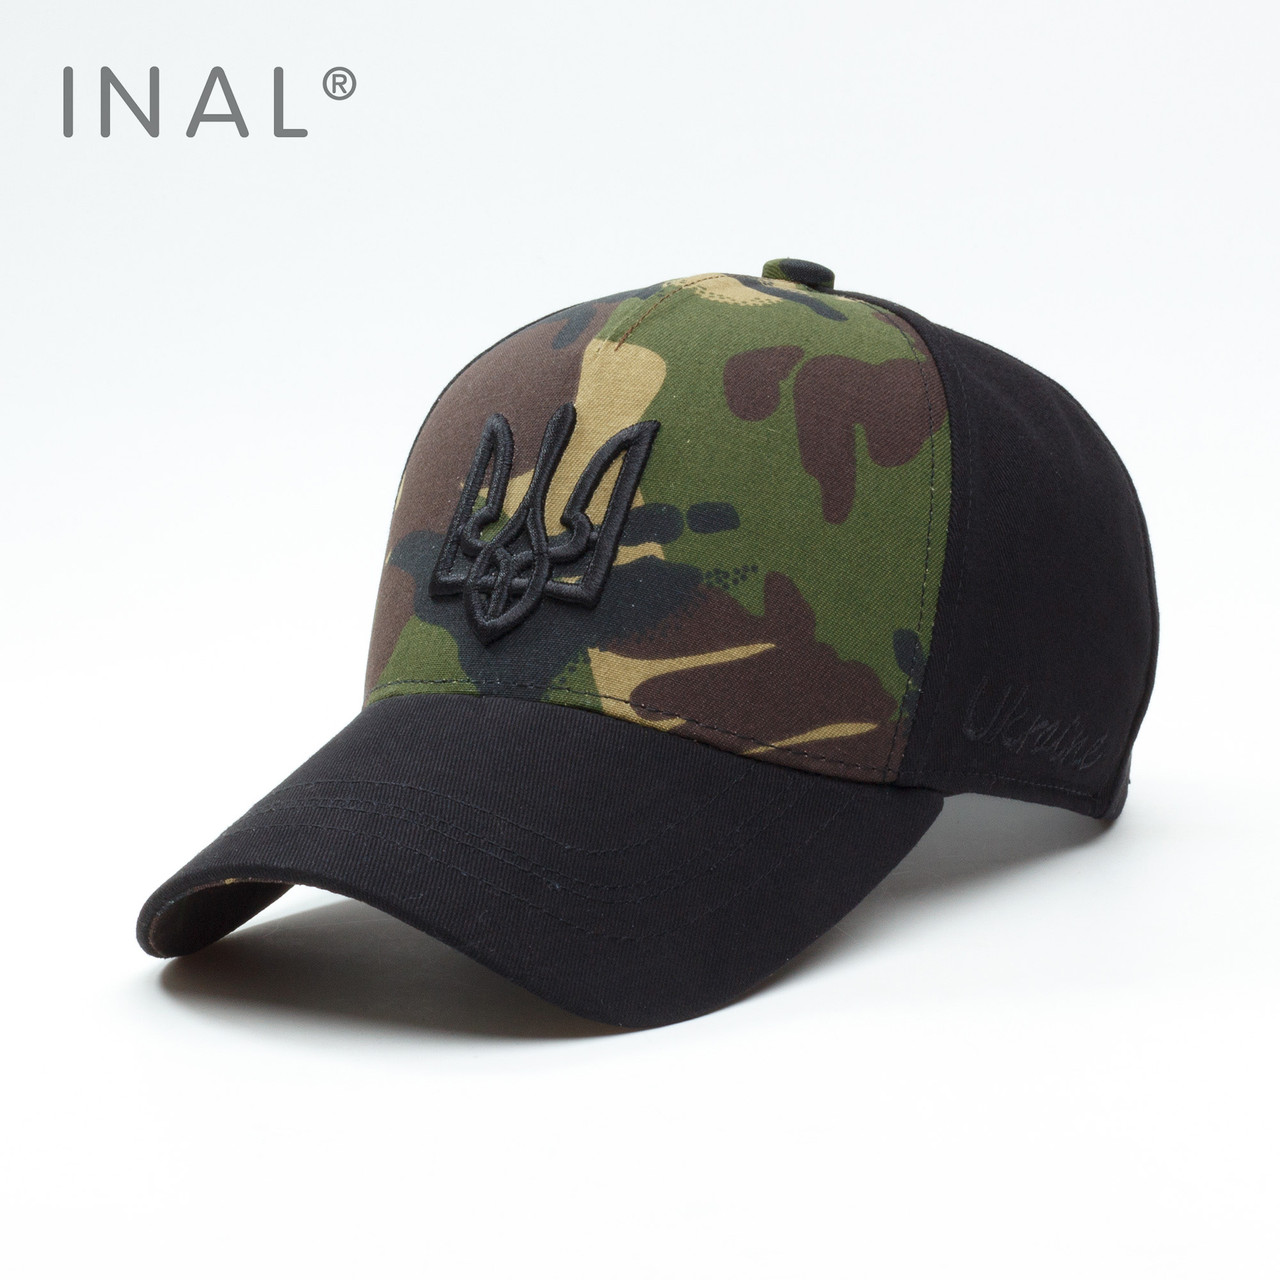 Кепка бейсболка INAL Ukraine UA L / 57-58 RU Хаки 187057